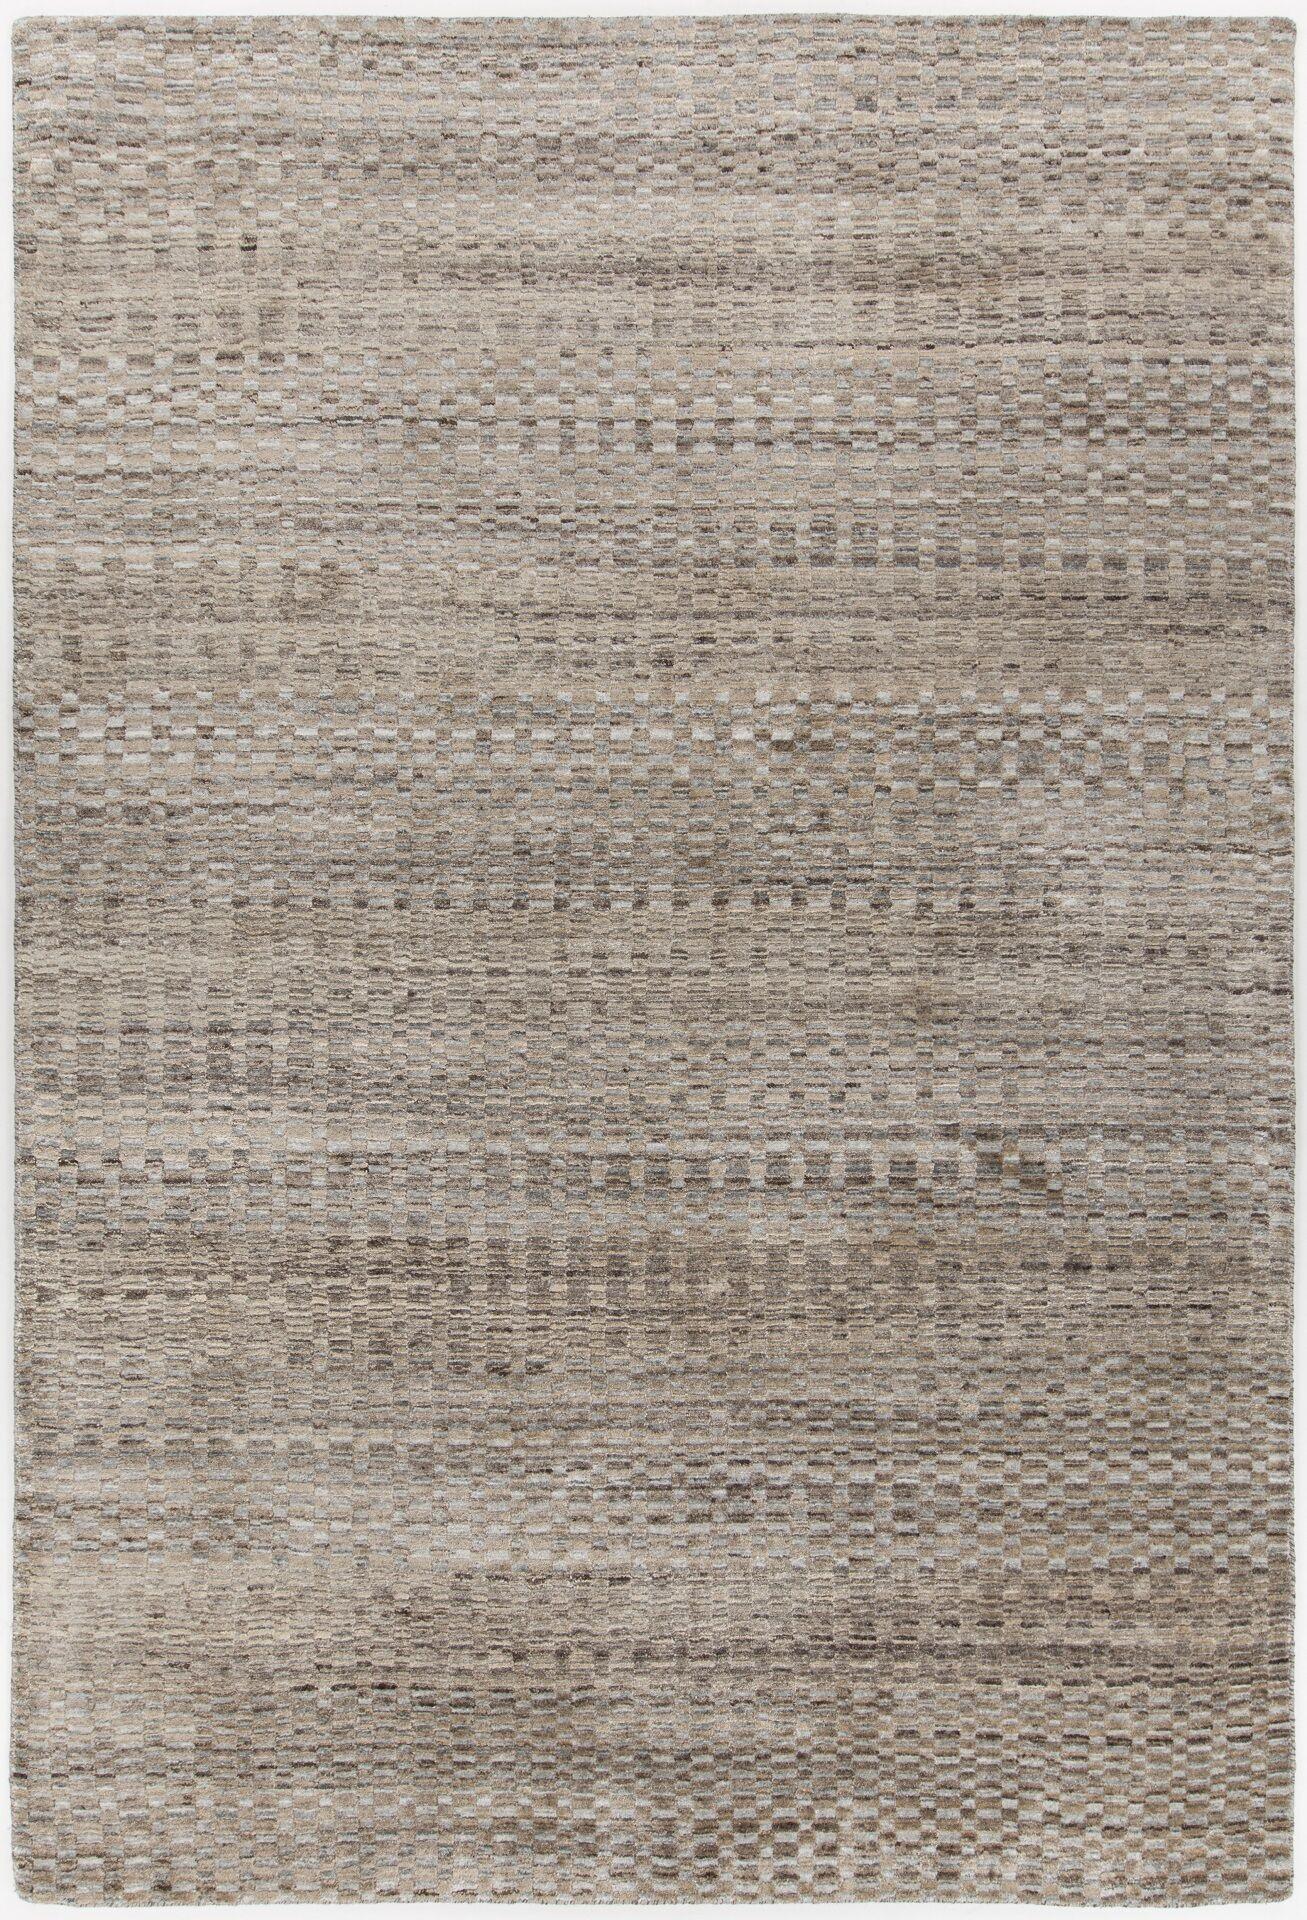 Hernan Hand-Woven Brown Area Rug Rug Size: Rectangle 5' x 7'6